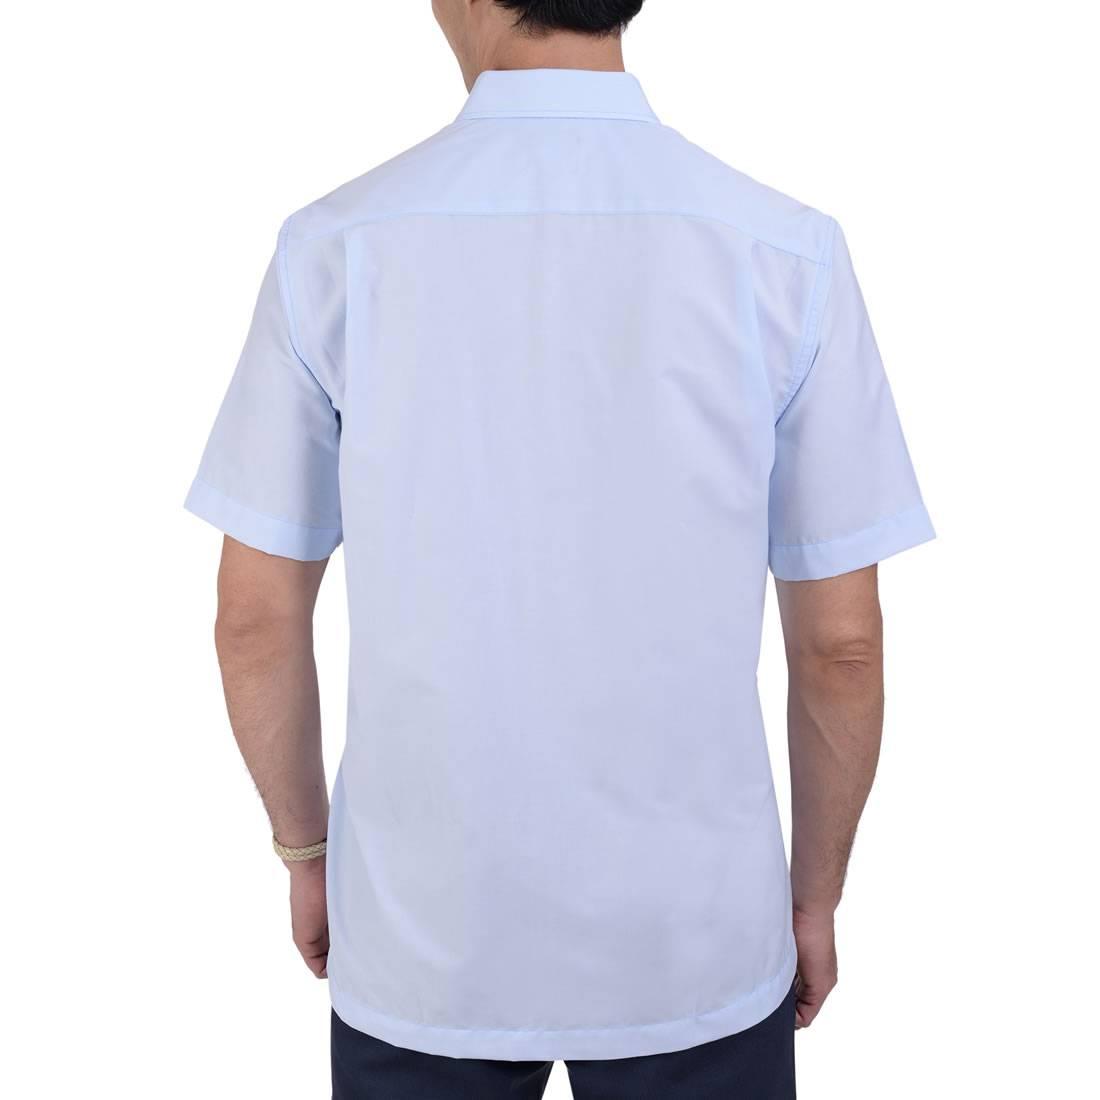 042379432110-03-Camisa-Casual-Manga-Corta-Classic-Fit-Azul-yale